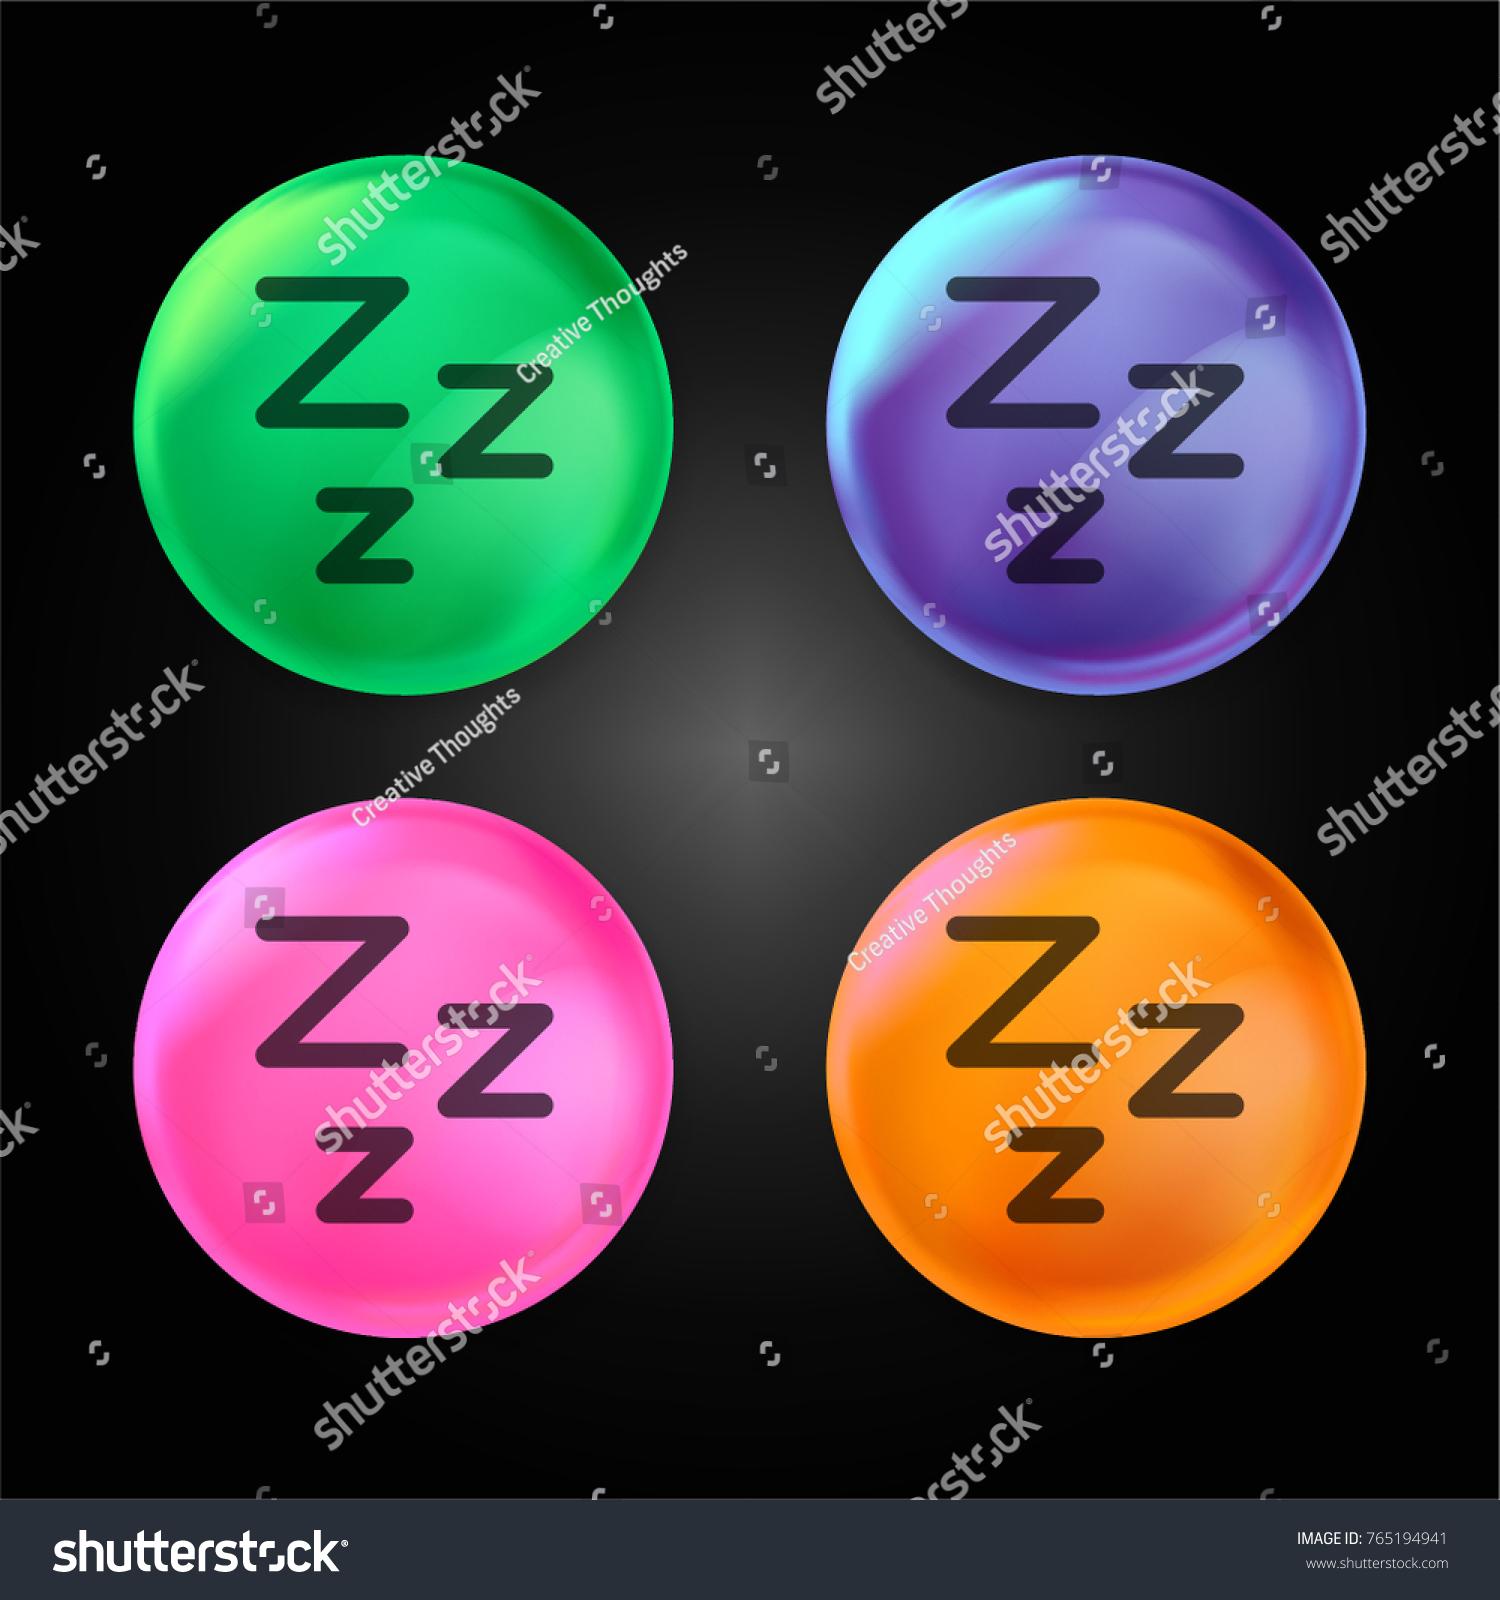 Zzz text symbol choice image symbol and sign ideas zzz sleep symbol crystal ball design stock vector 765194941 zzz sleep symbol crystal ball design icon buycottarizona Choice Image